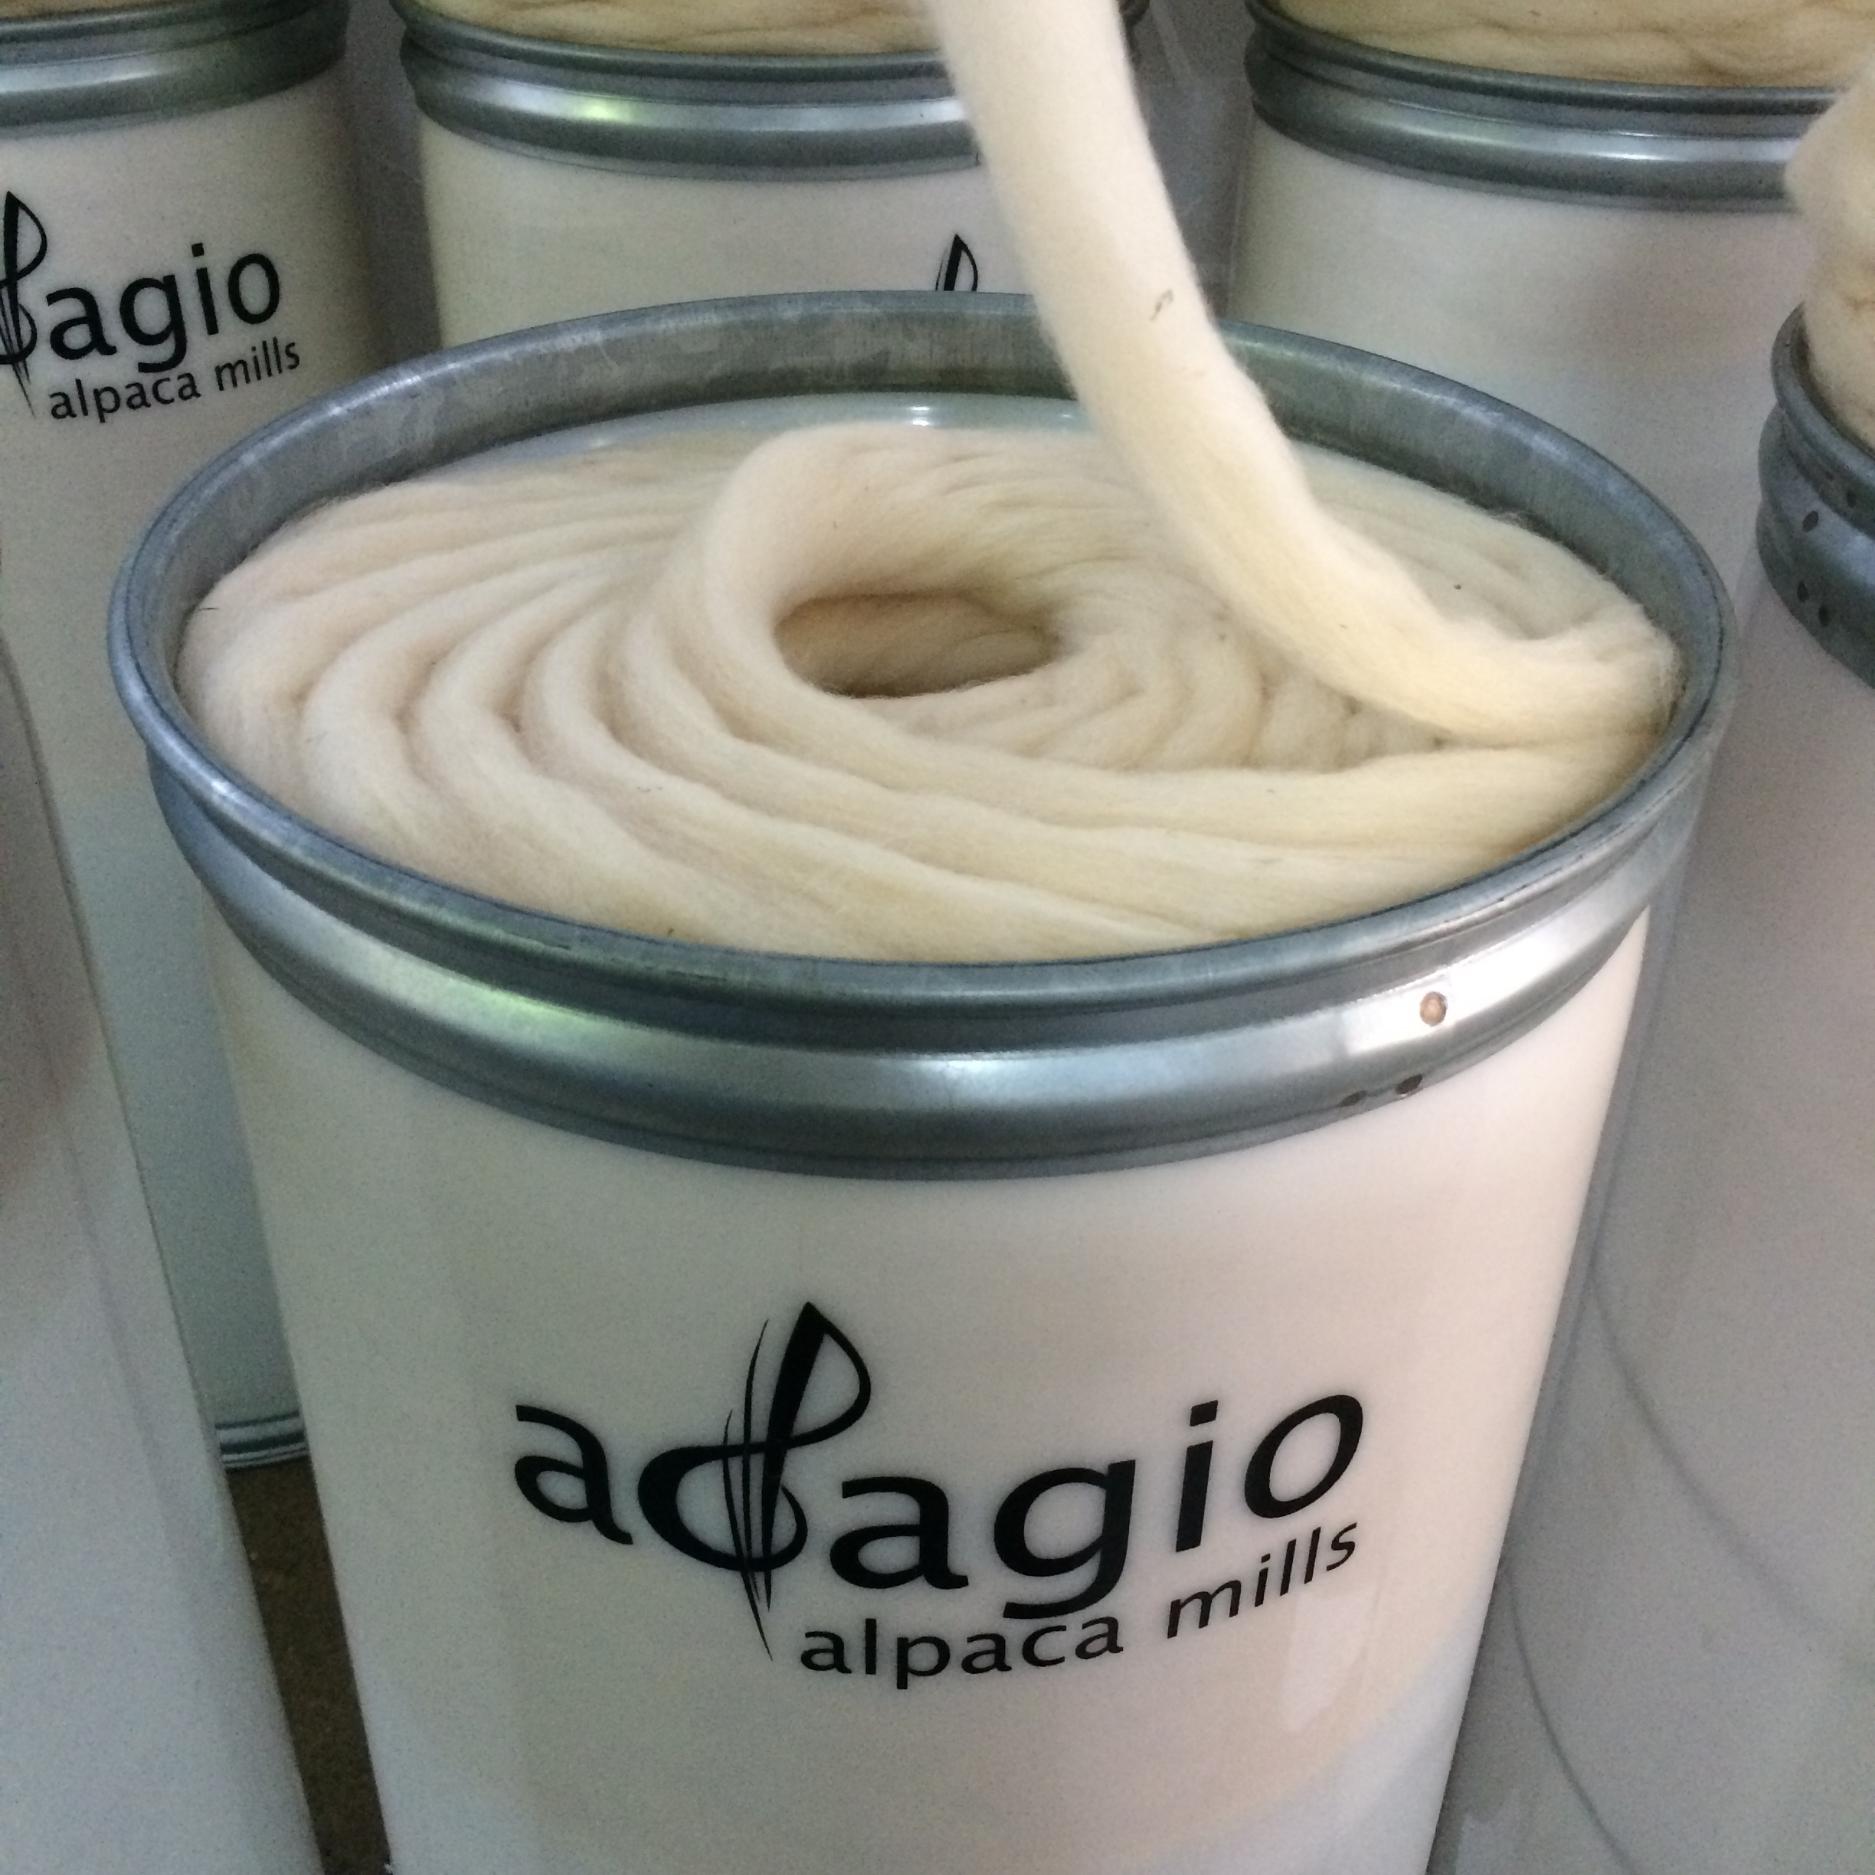 adagio_rovings_coils.jpg